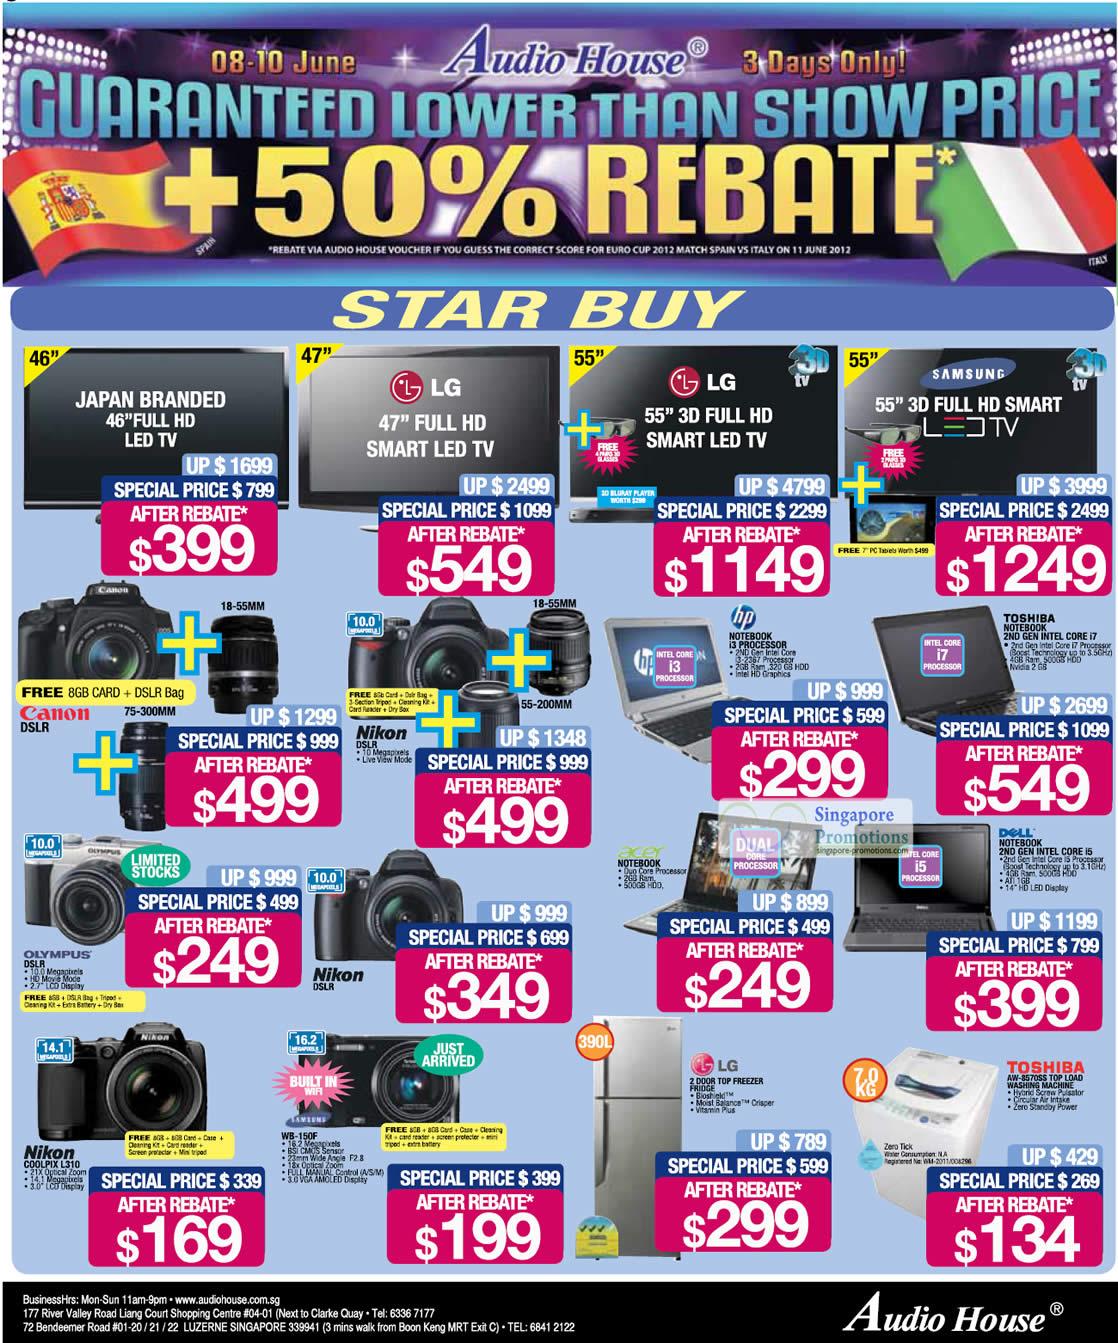 TOSHIBA AW-8570SS Washer, Nikon COOLPIX L310 Digital Camera, Samsung WB-150F Digital Camera